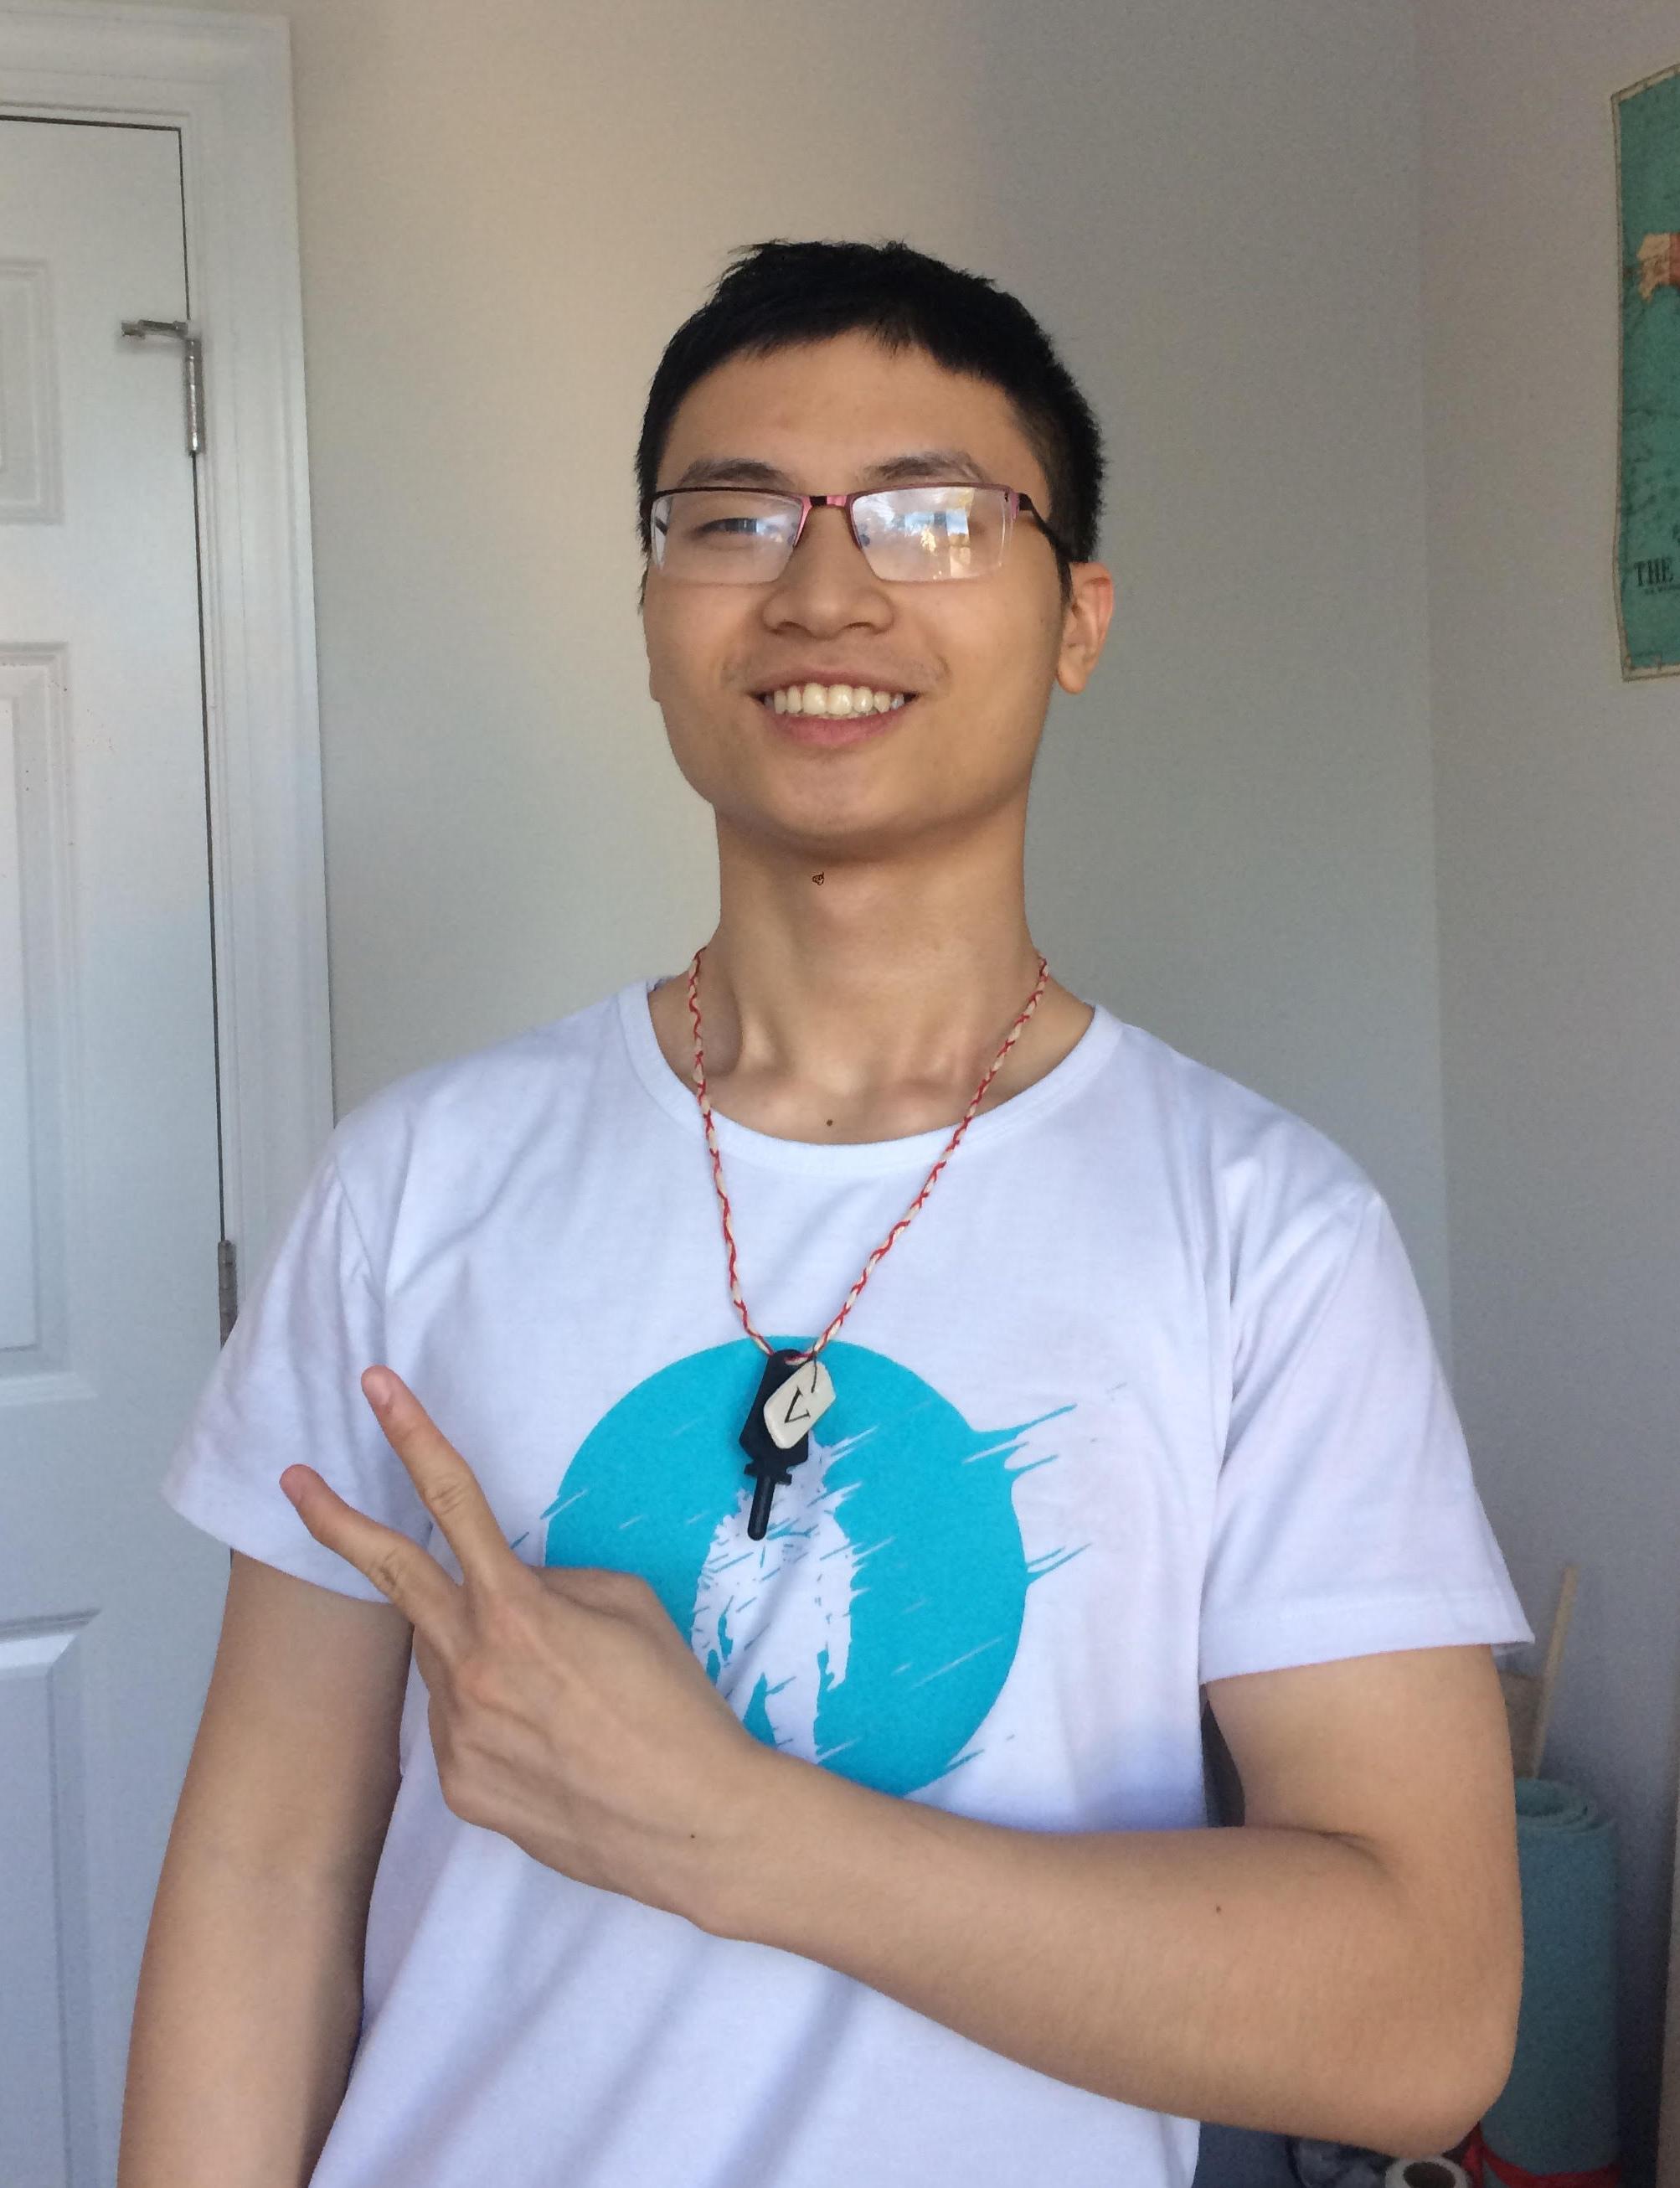 man-intern-with-glasses